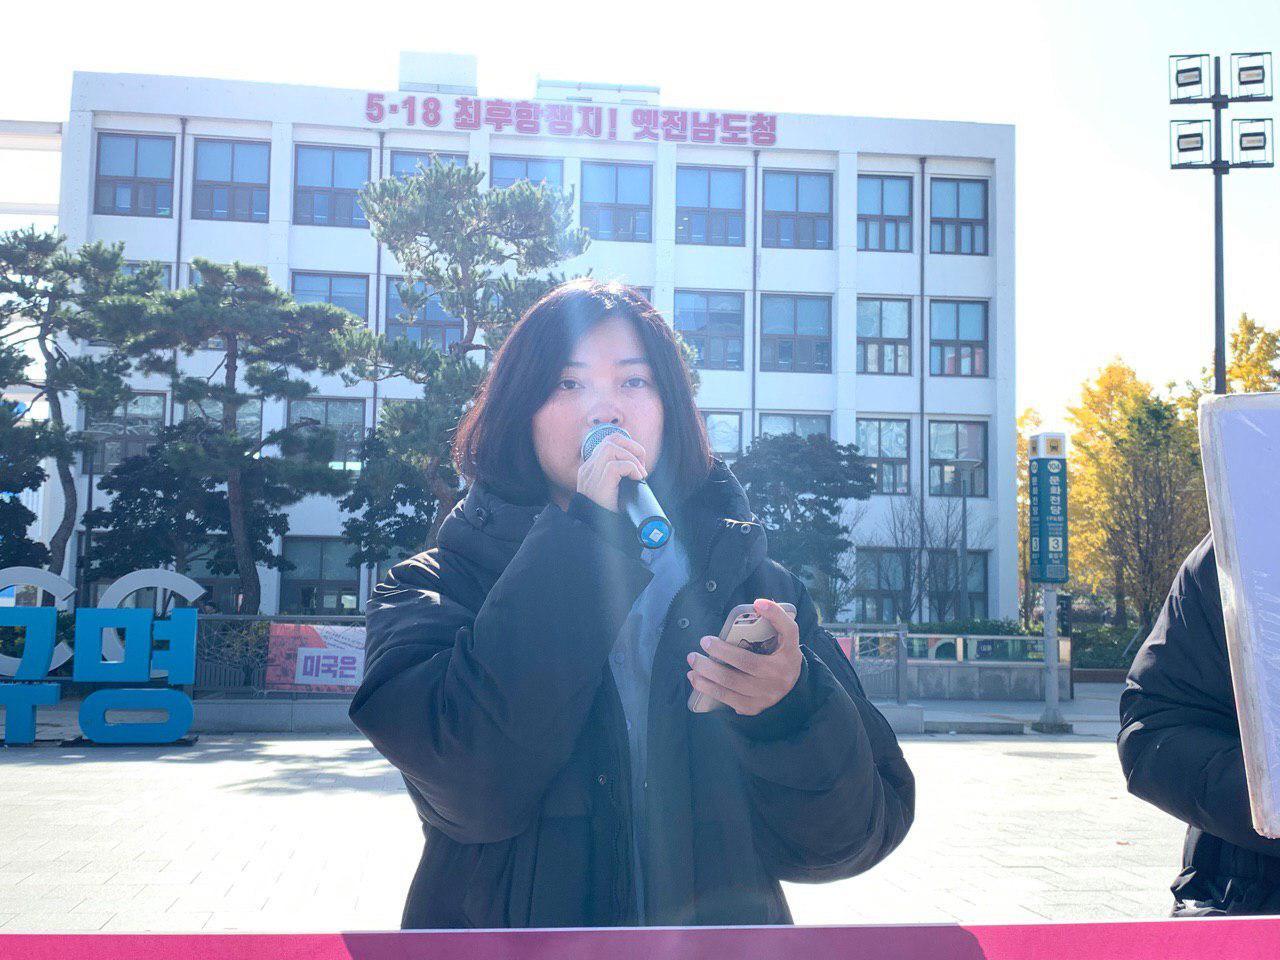 photo_2019-11-15_09-21-19.jpg